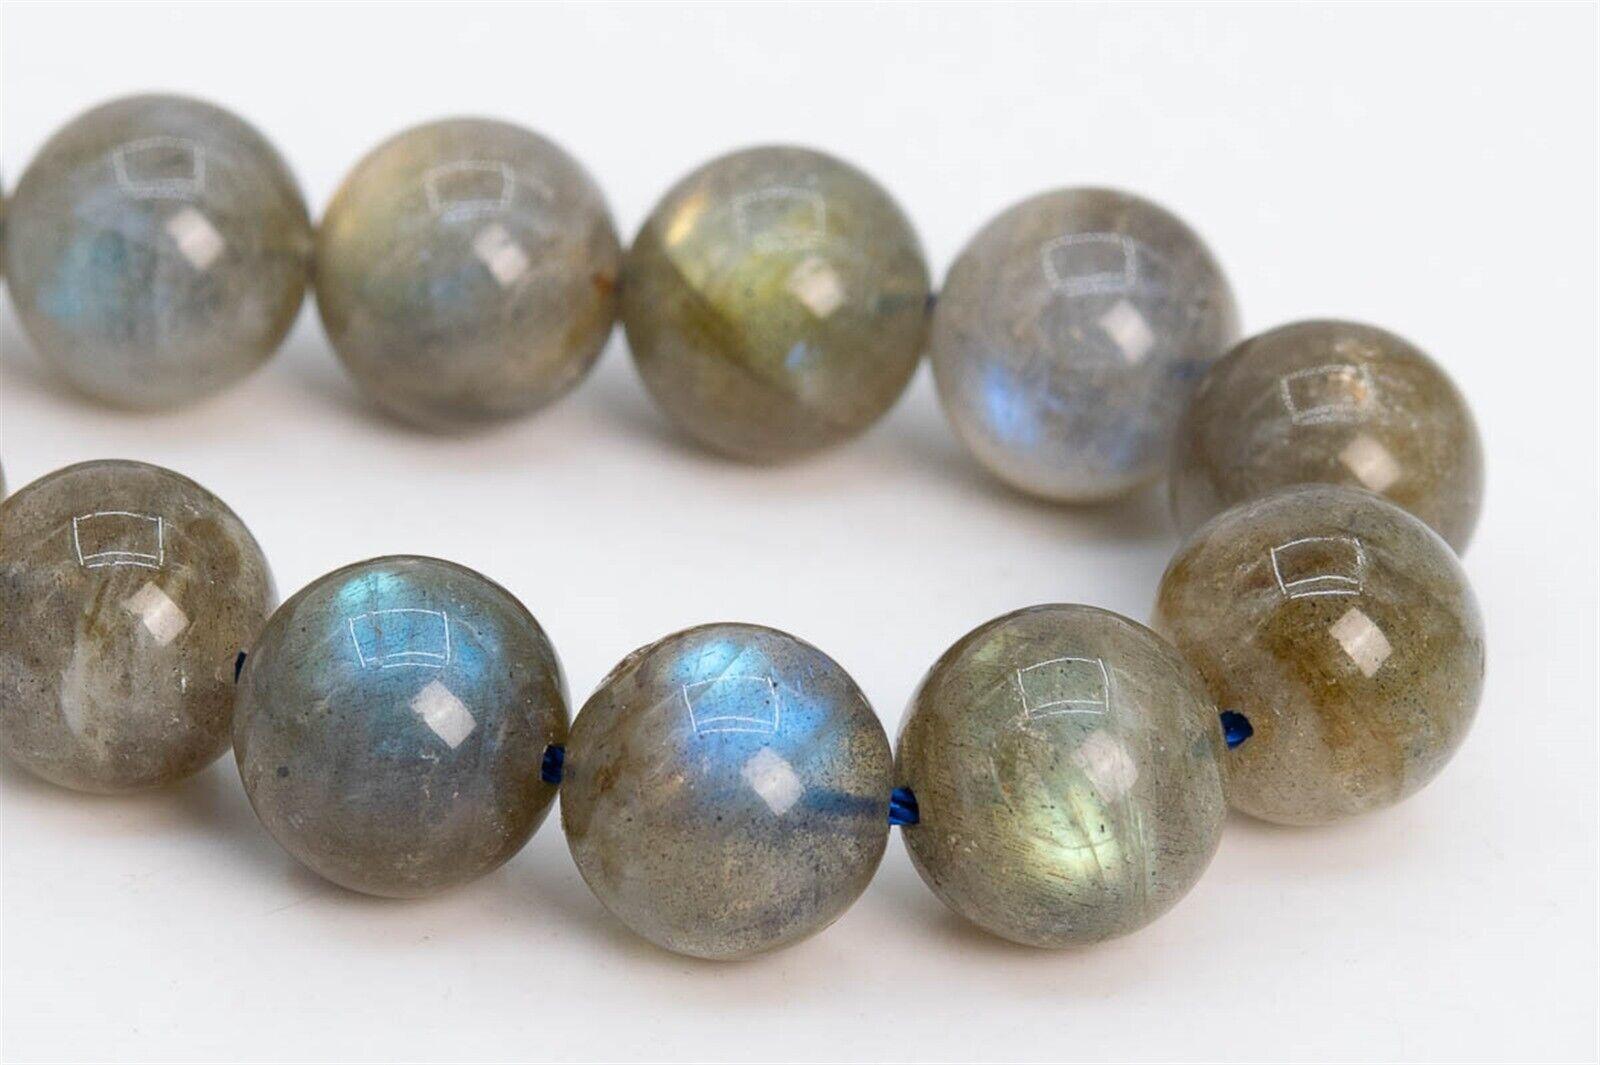 109830h-3081 Genuine Natural Gemstone Half Strand Round Loose Beads 7.5 9-10MM Gray Labradorite Beads Madagascar Grade A